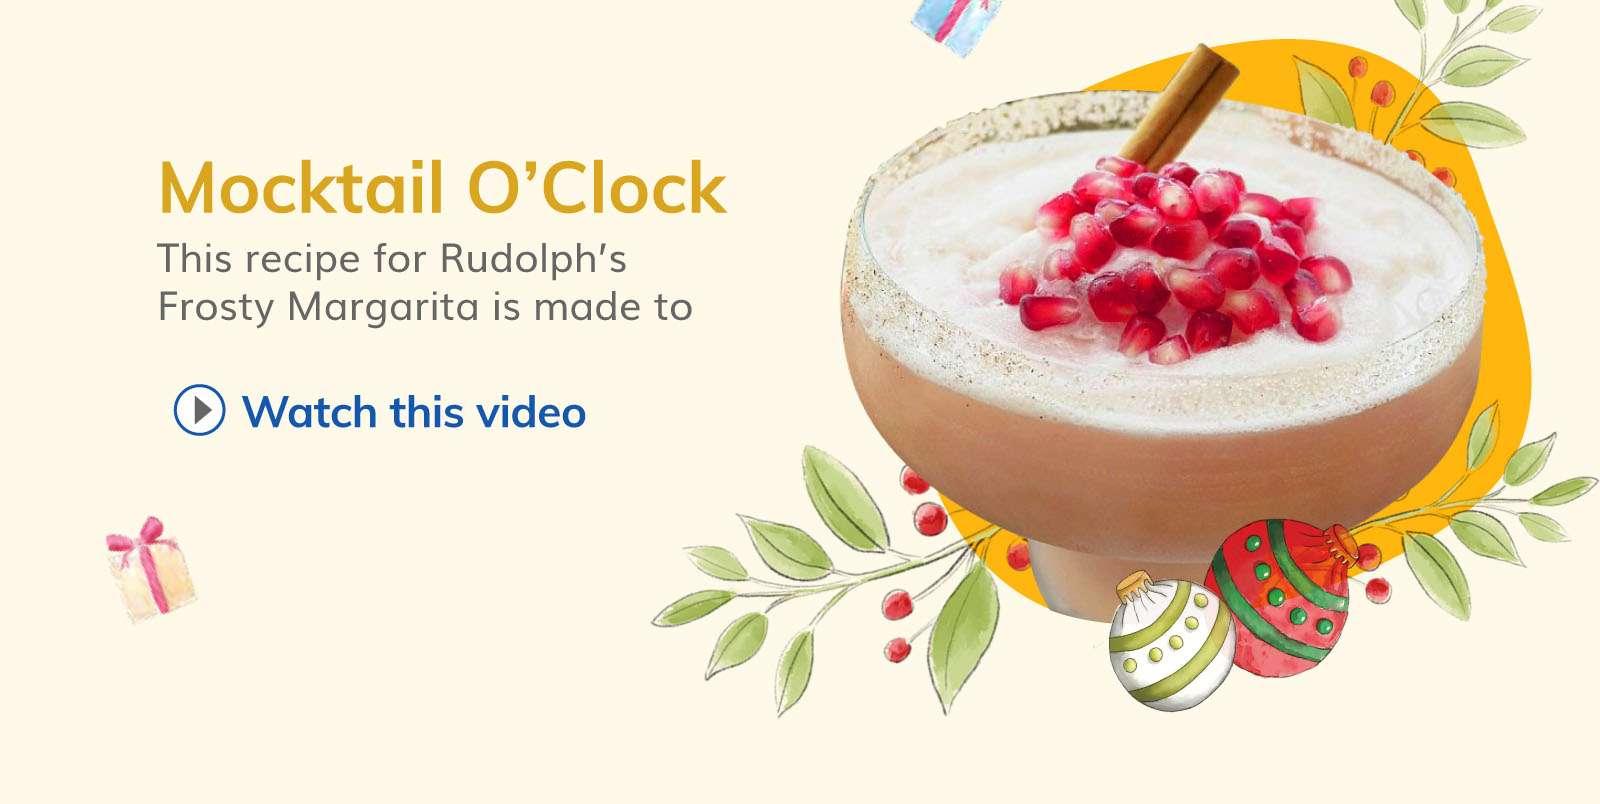 Mocktail O'Clock